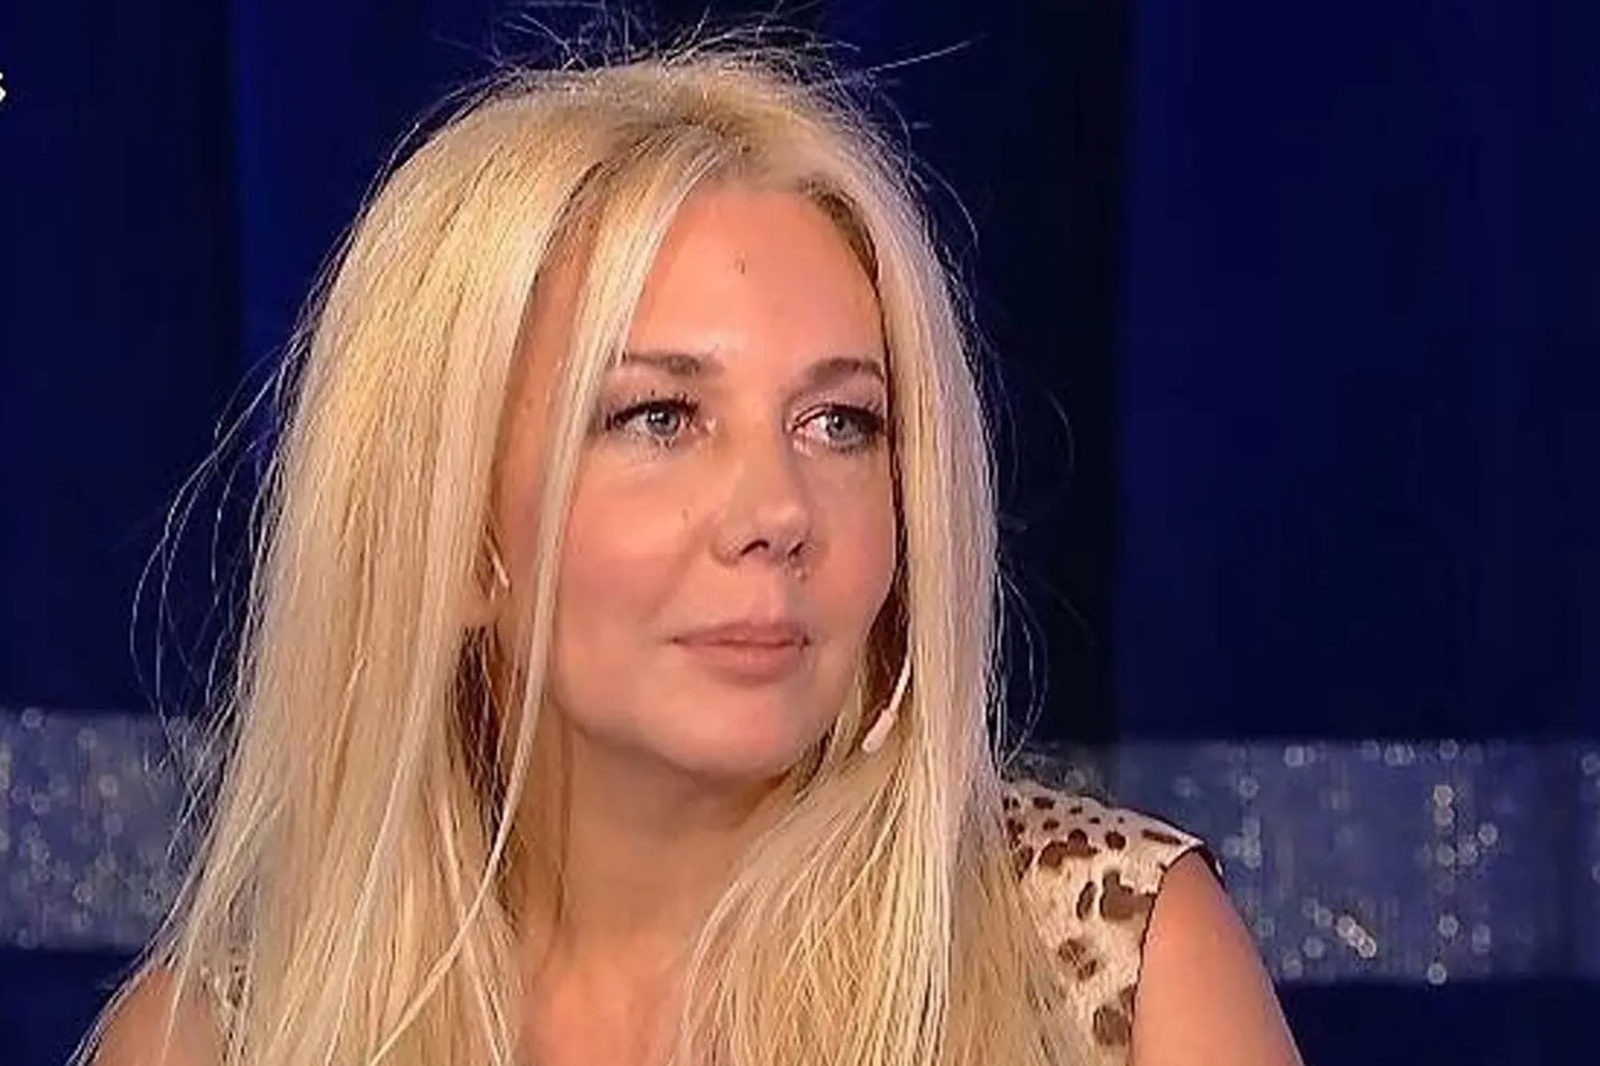 Se filtró un escandaloso audio de Mariana Nannis contra Claudio Caniggia